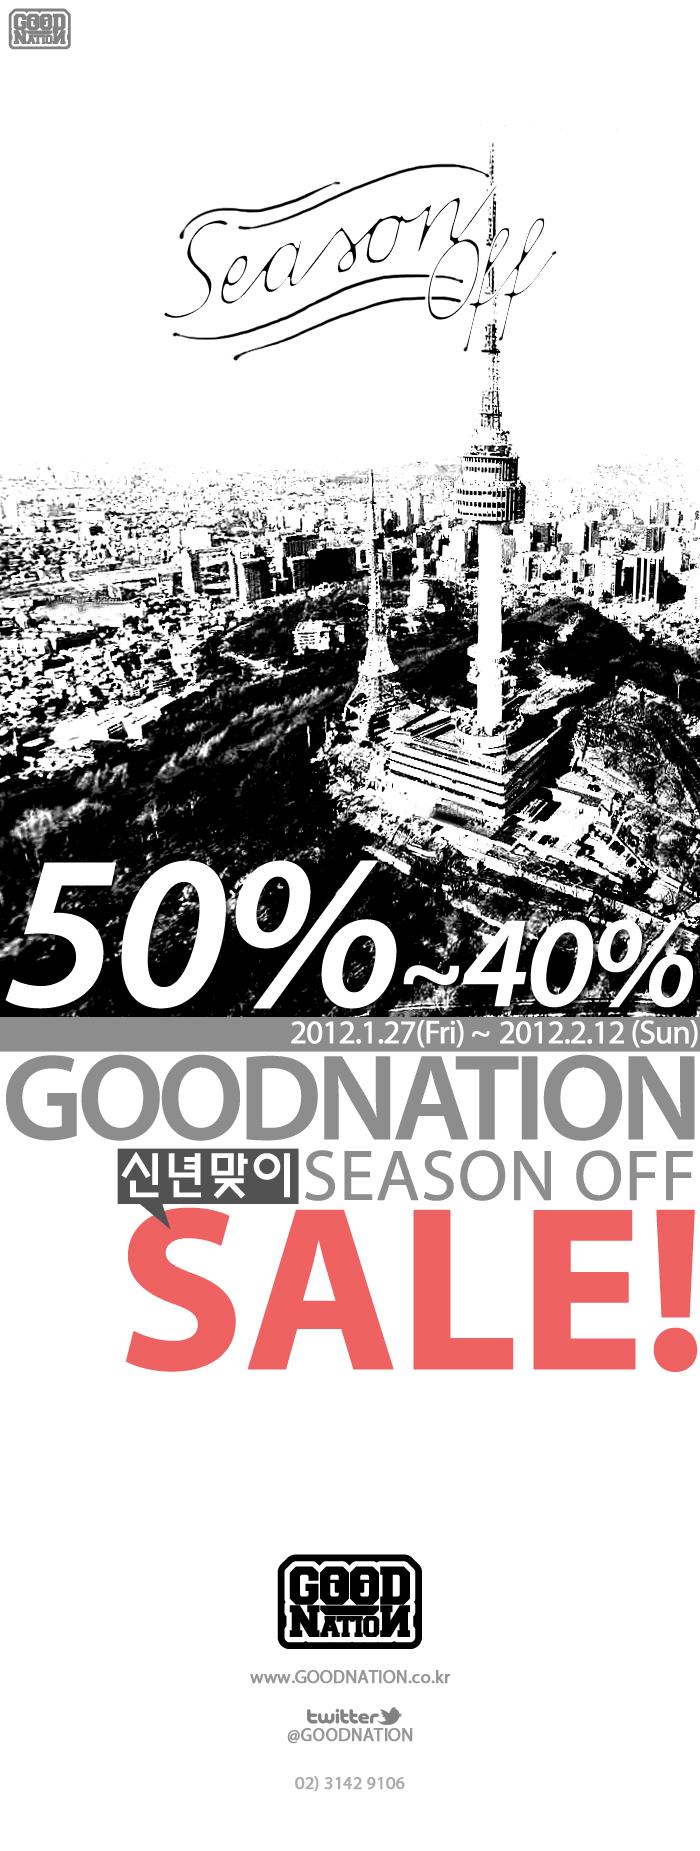 goodnation [굿네이션] 2012년 새해맞이 시즌오프 세일행사 진행안내